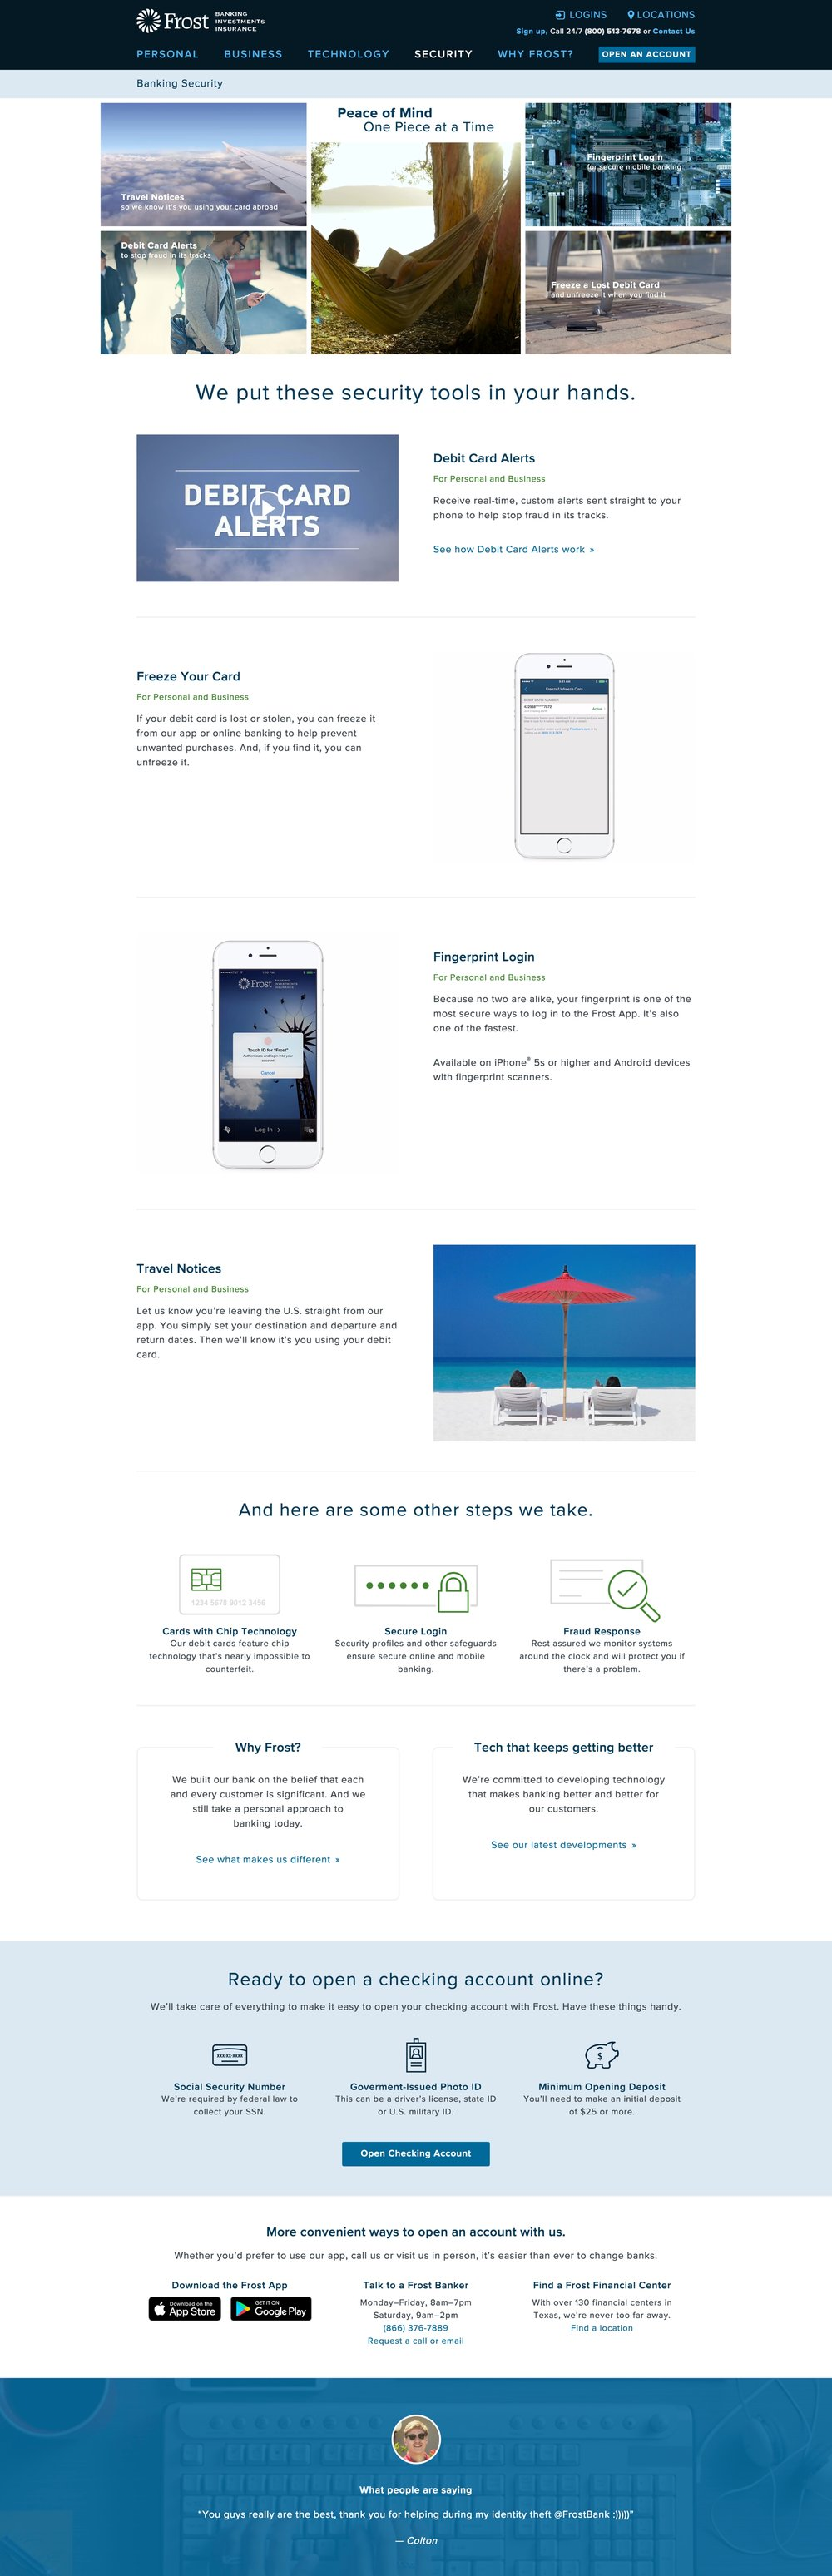 www.frostbank.com_banking_financial-security___ga%3D2.162585276.1073832354.1547158493-202942322.1503518686+%281%29.jpg